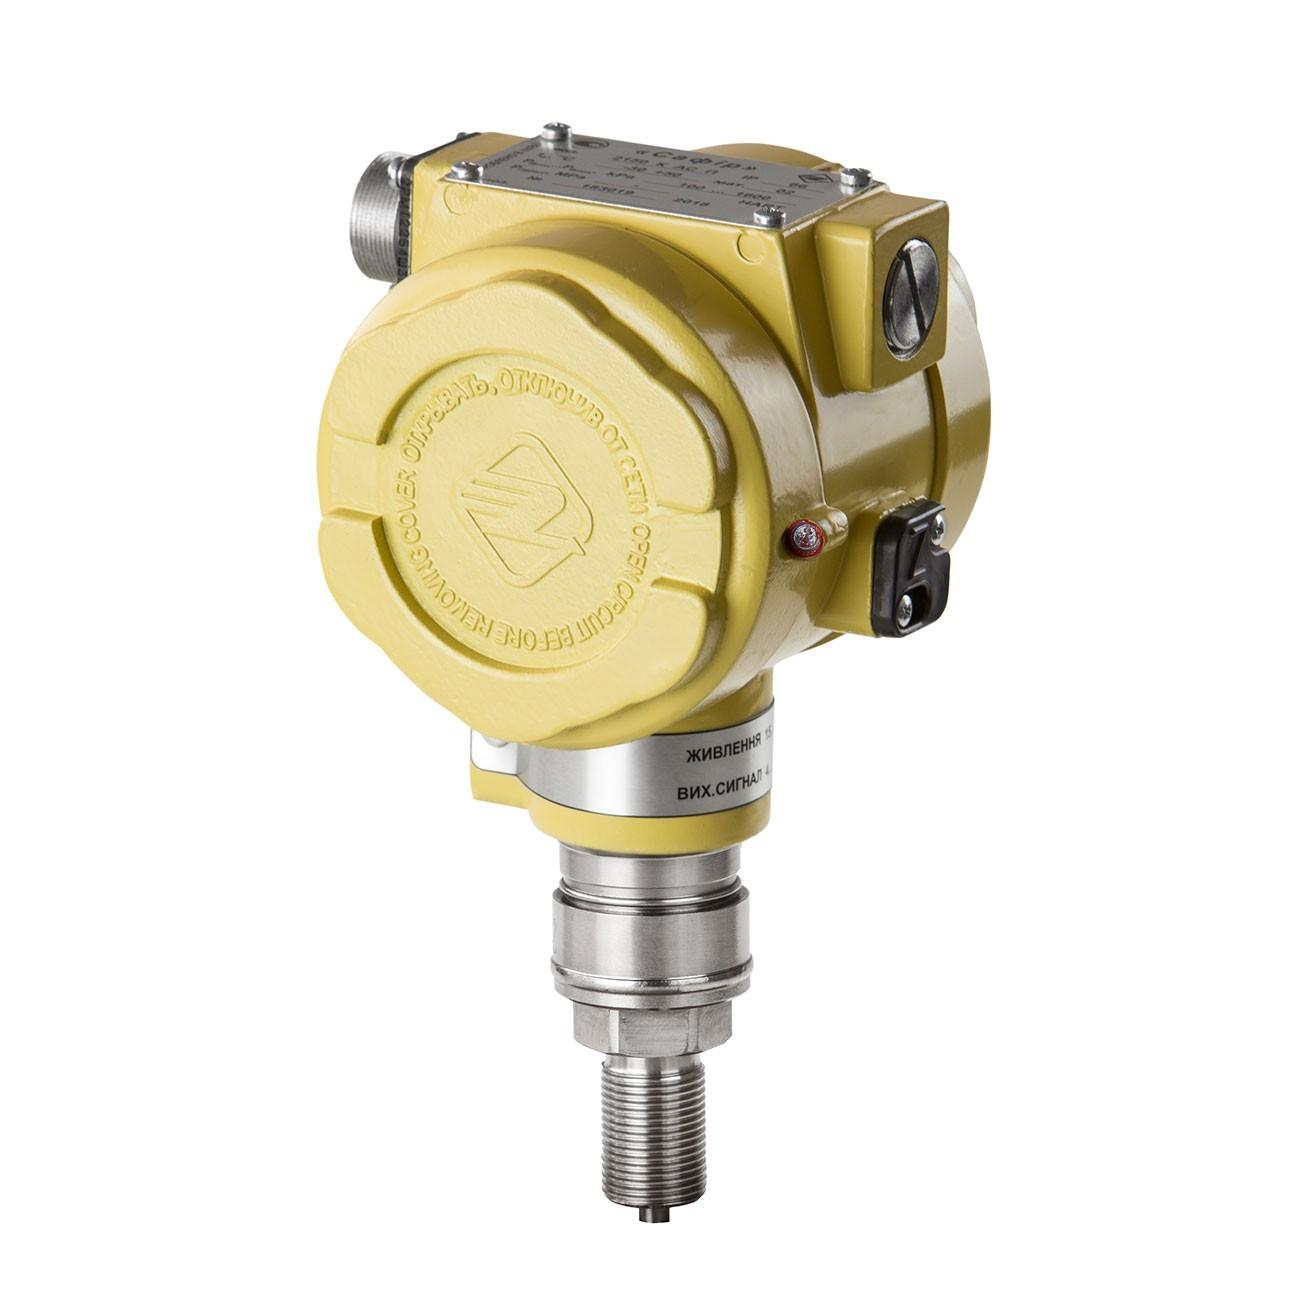 Analog Gauge Pressure Transmitters Safir 2151, 2161, 2171, 2351